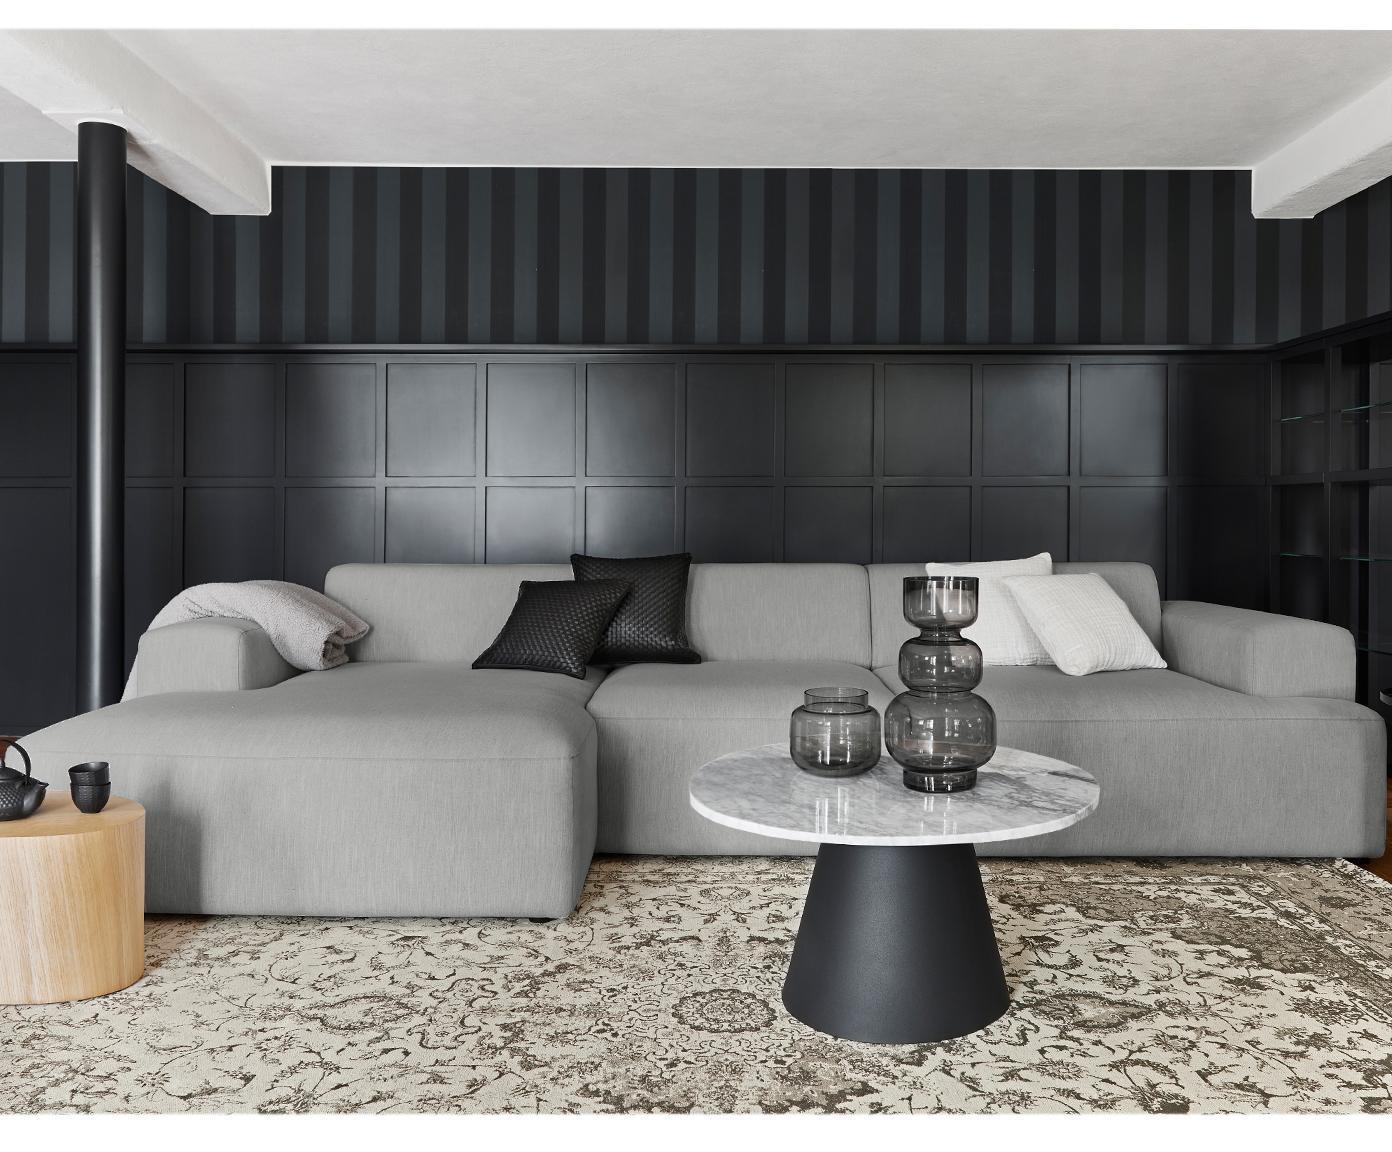 Hoekbank Melva (4-zits), Bekleding: polyester, Frame: massief grenenhout, spaan, Poten: grenenhout, Geweven stof grijs, B 319 x D 144 cm